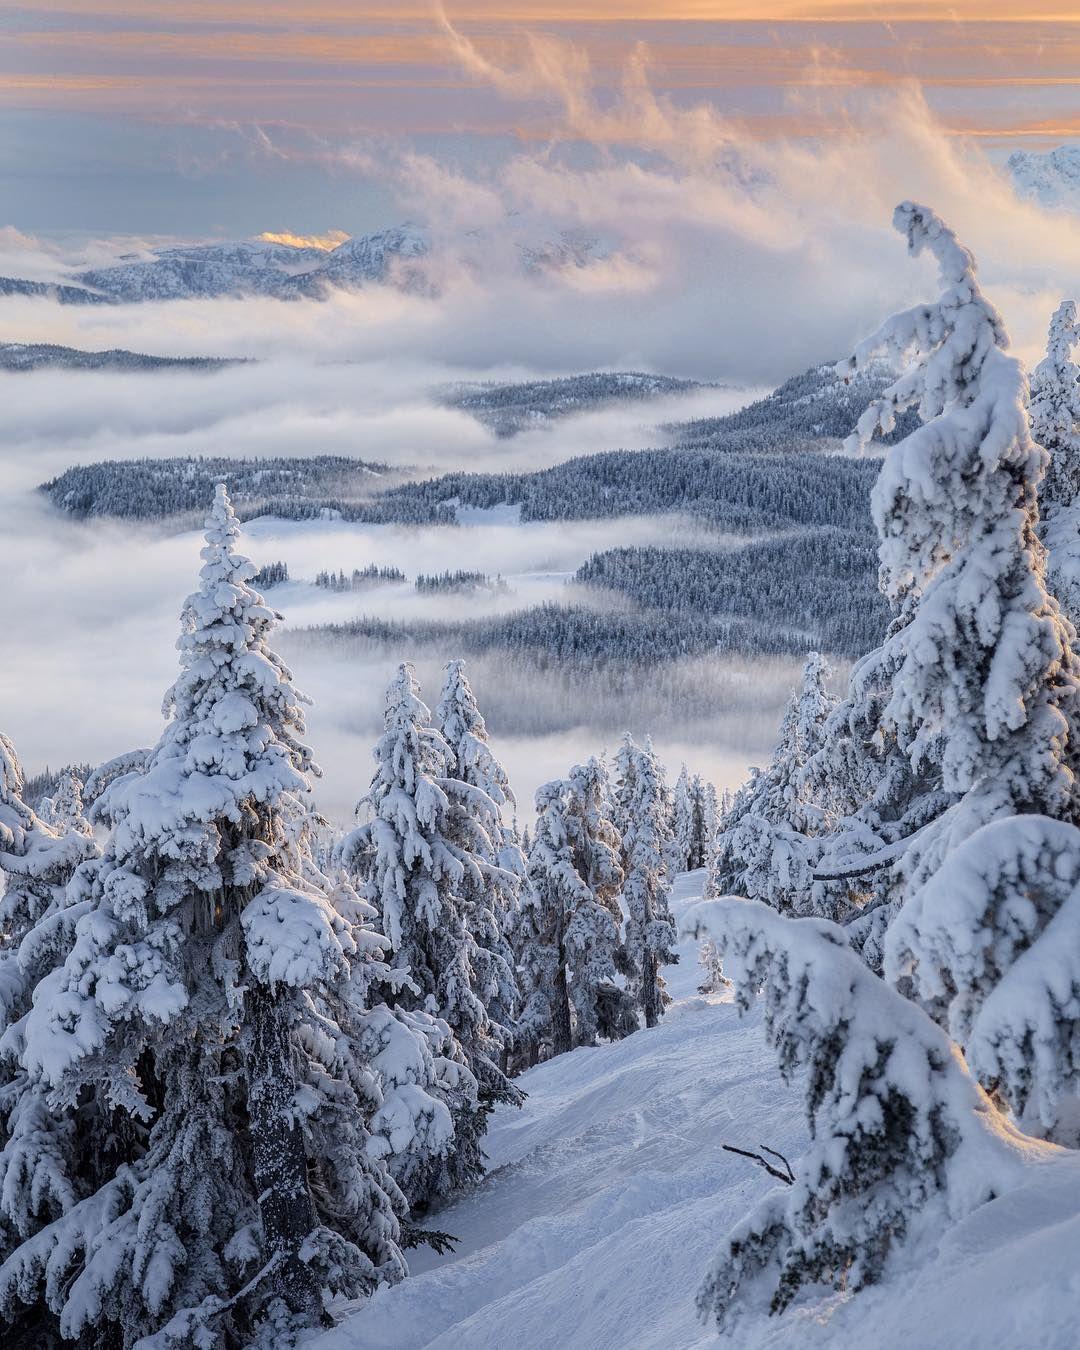 6 Ways to Kick Start 2019 | Winter scenes ❄☔❄ | Winter